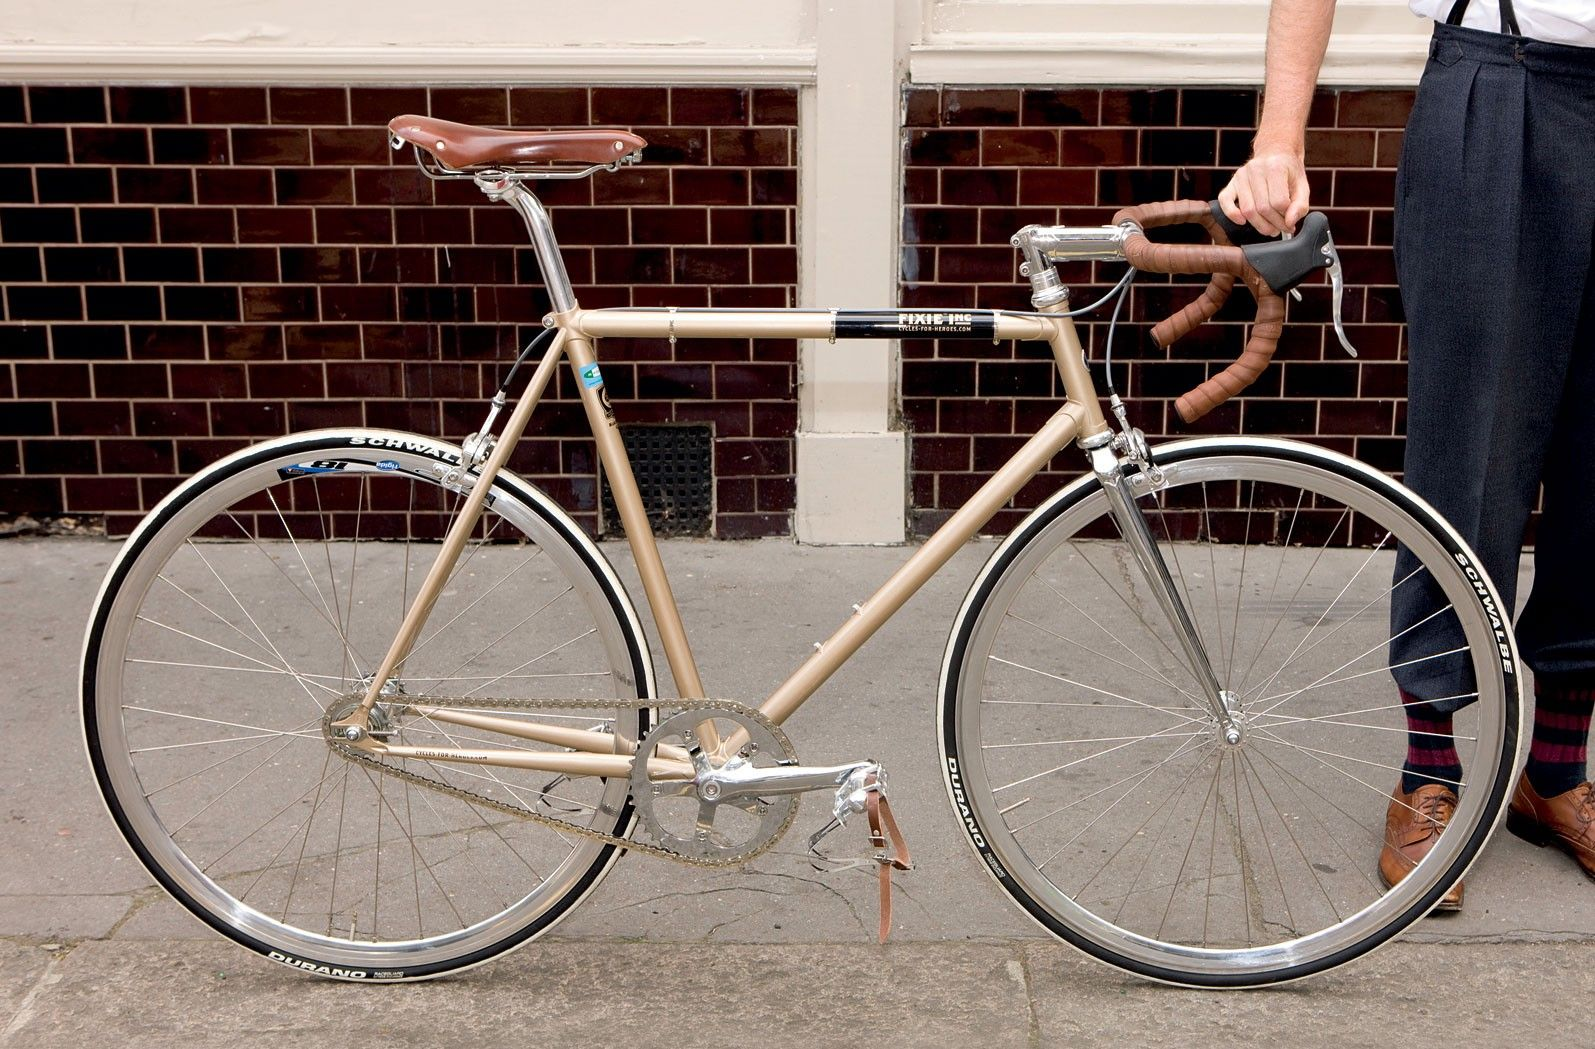 Pin en Bikes & Bicycles